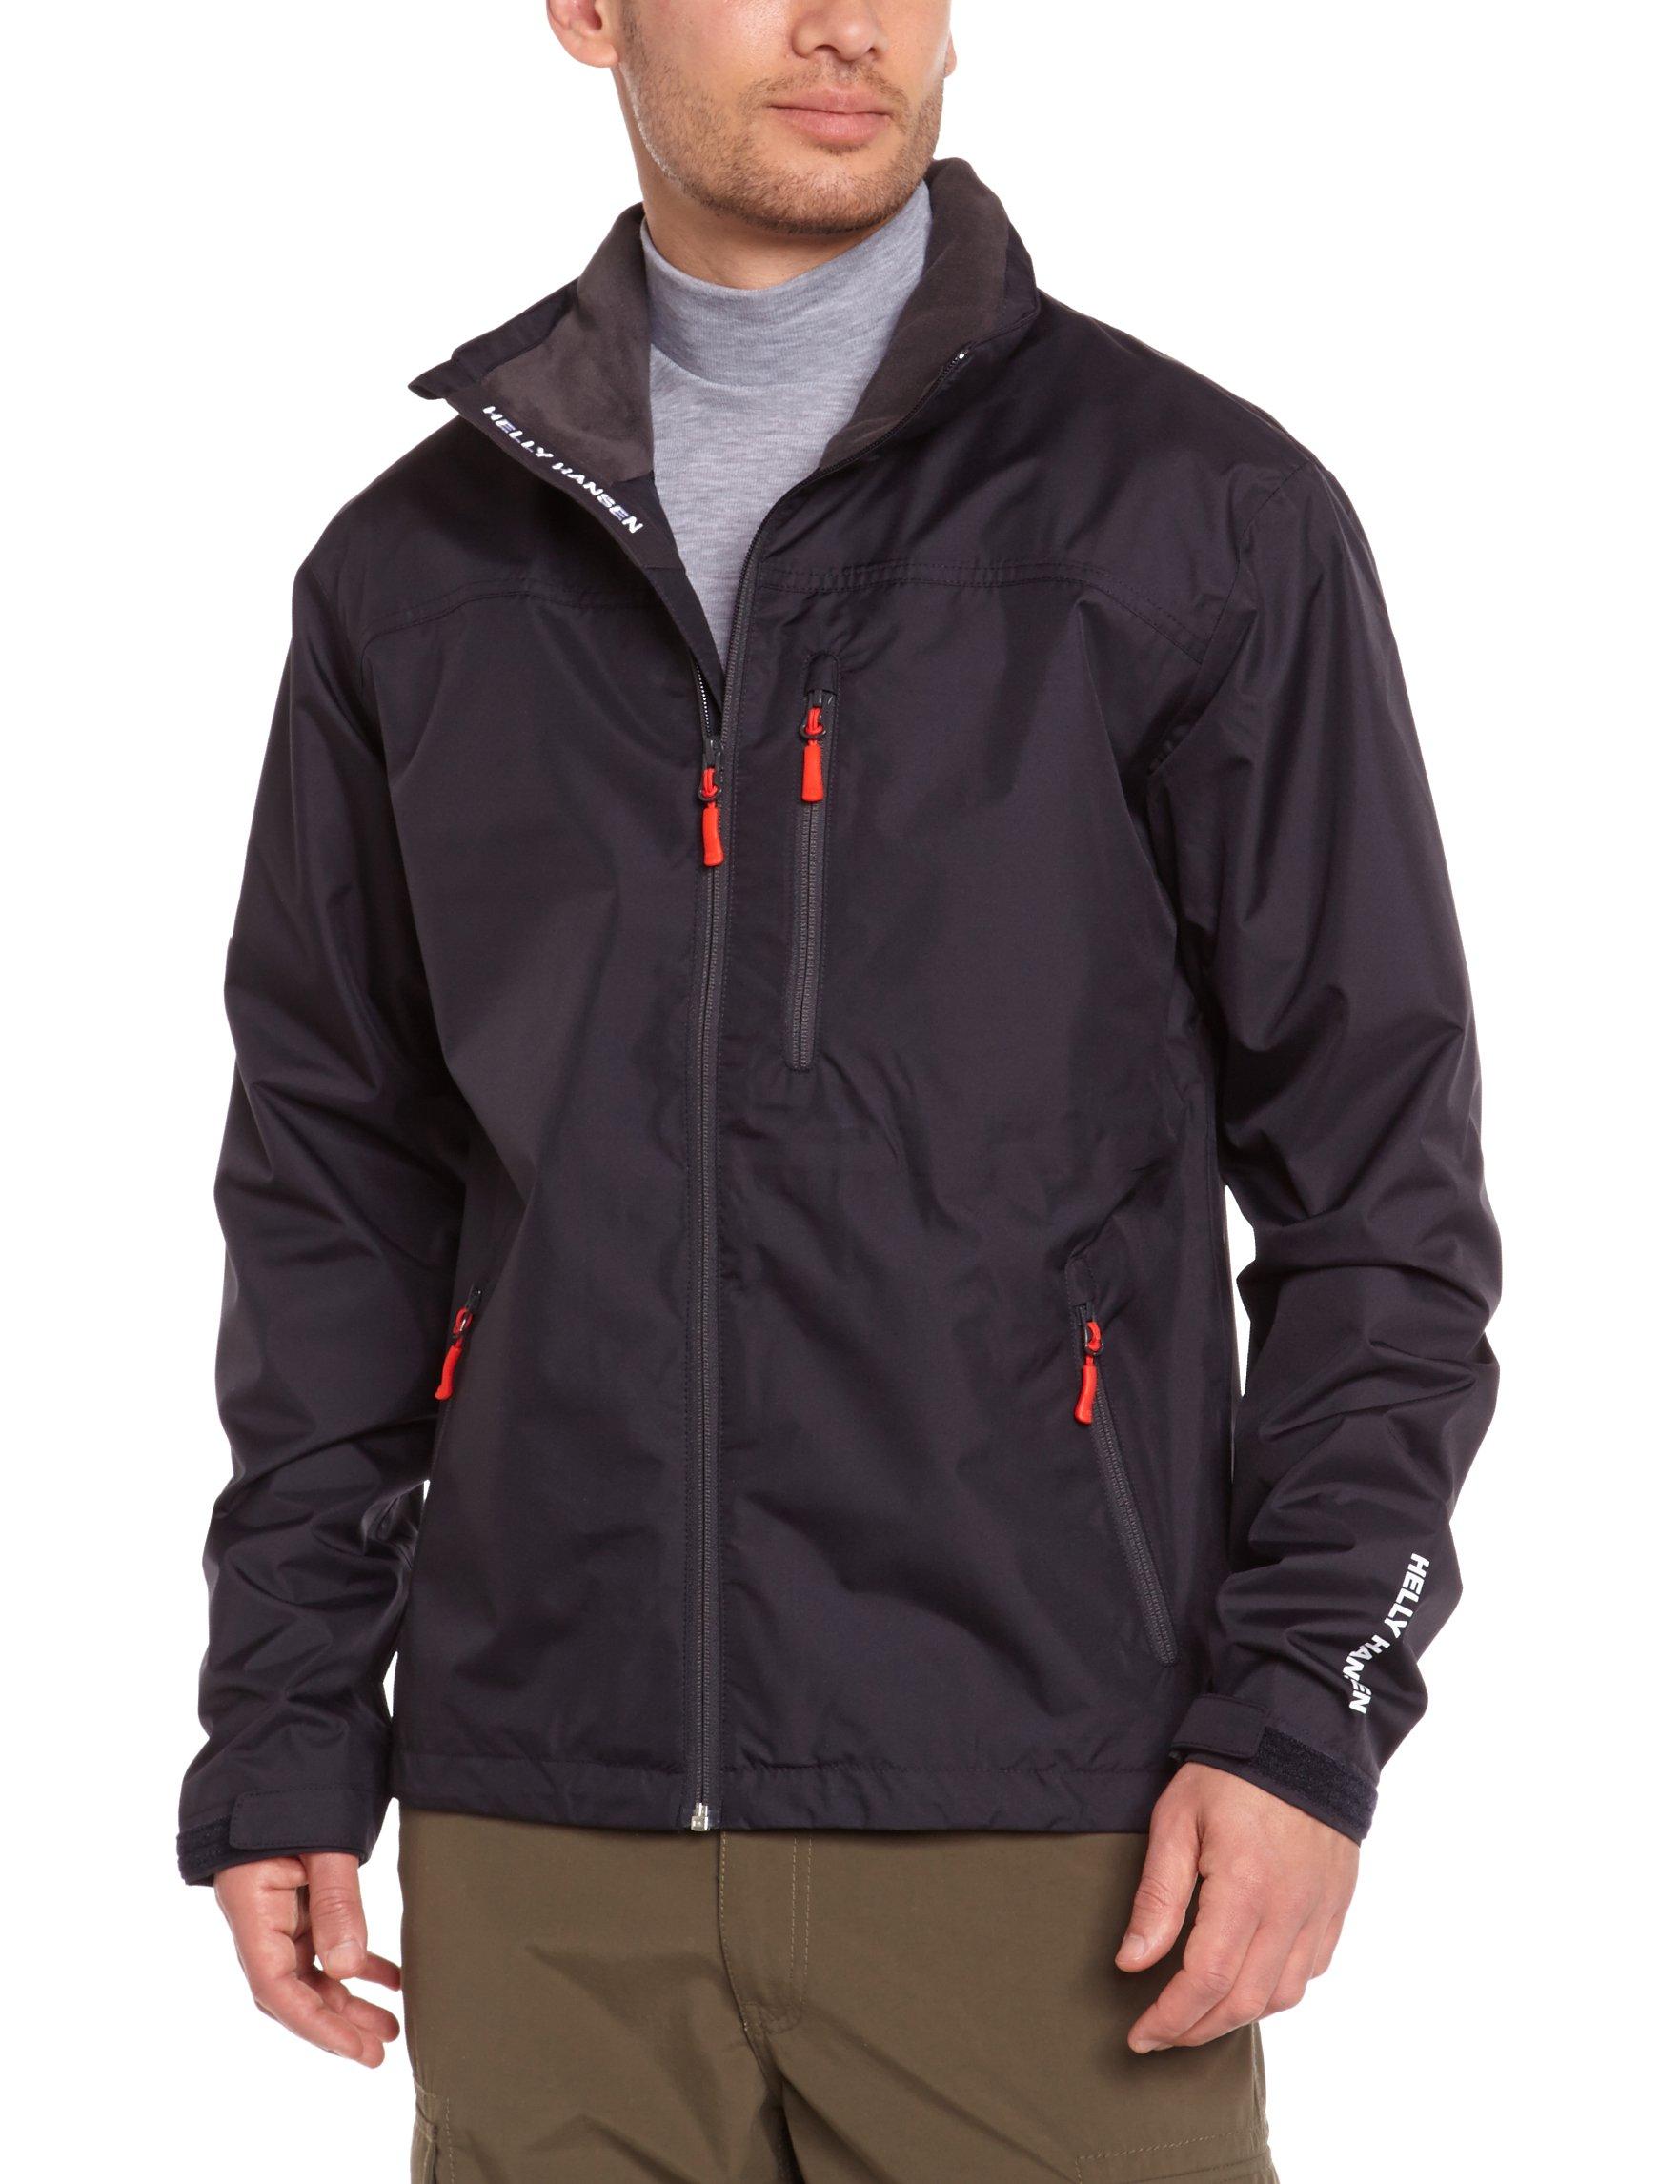 Helly Hansen Men's Crew Rain Jacket, Navy, X-Large